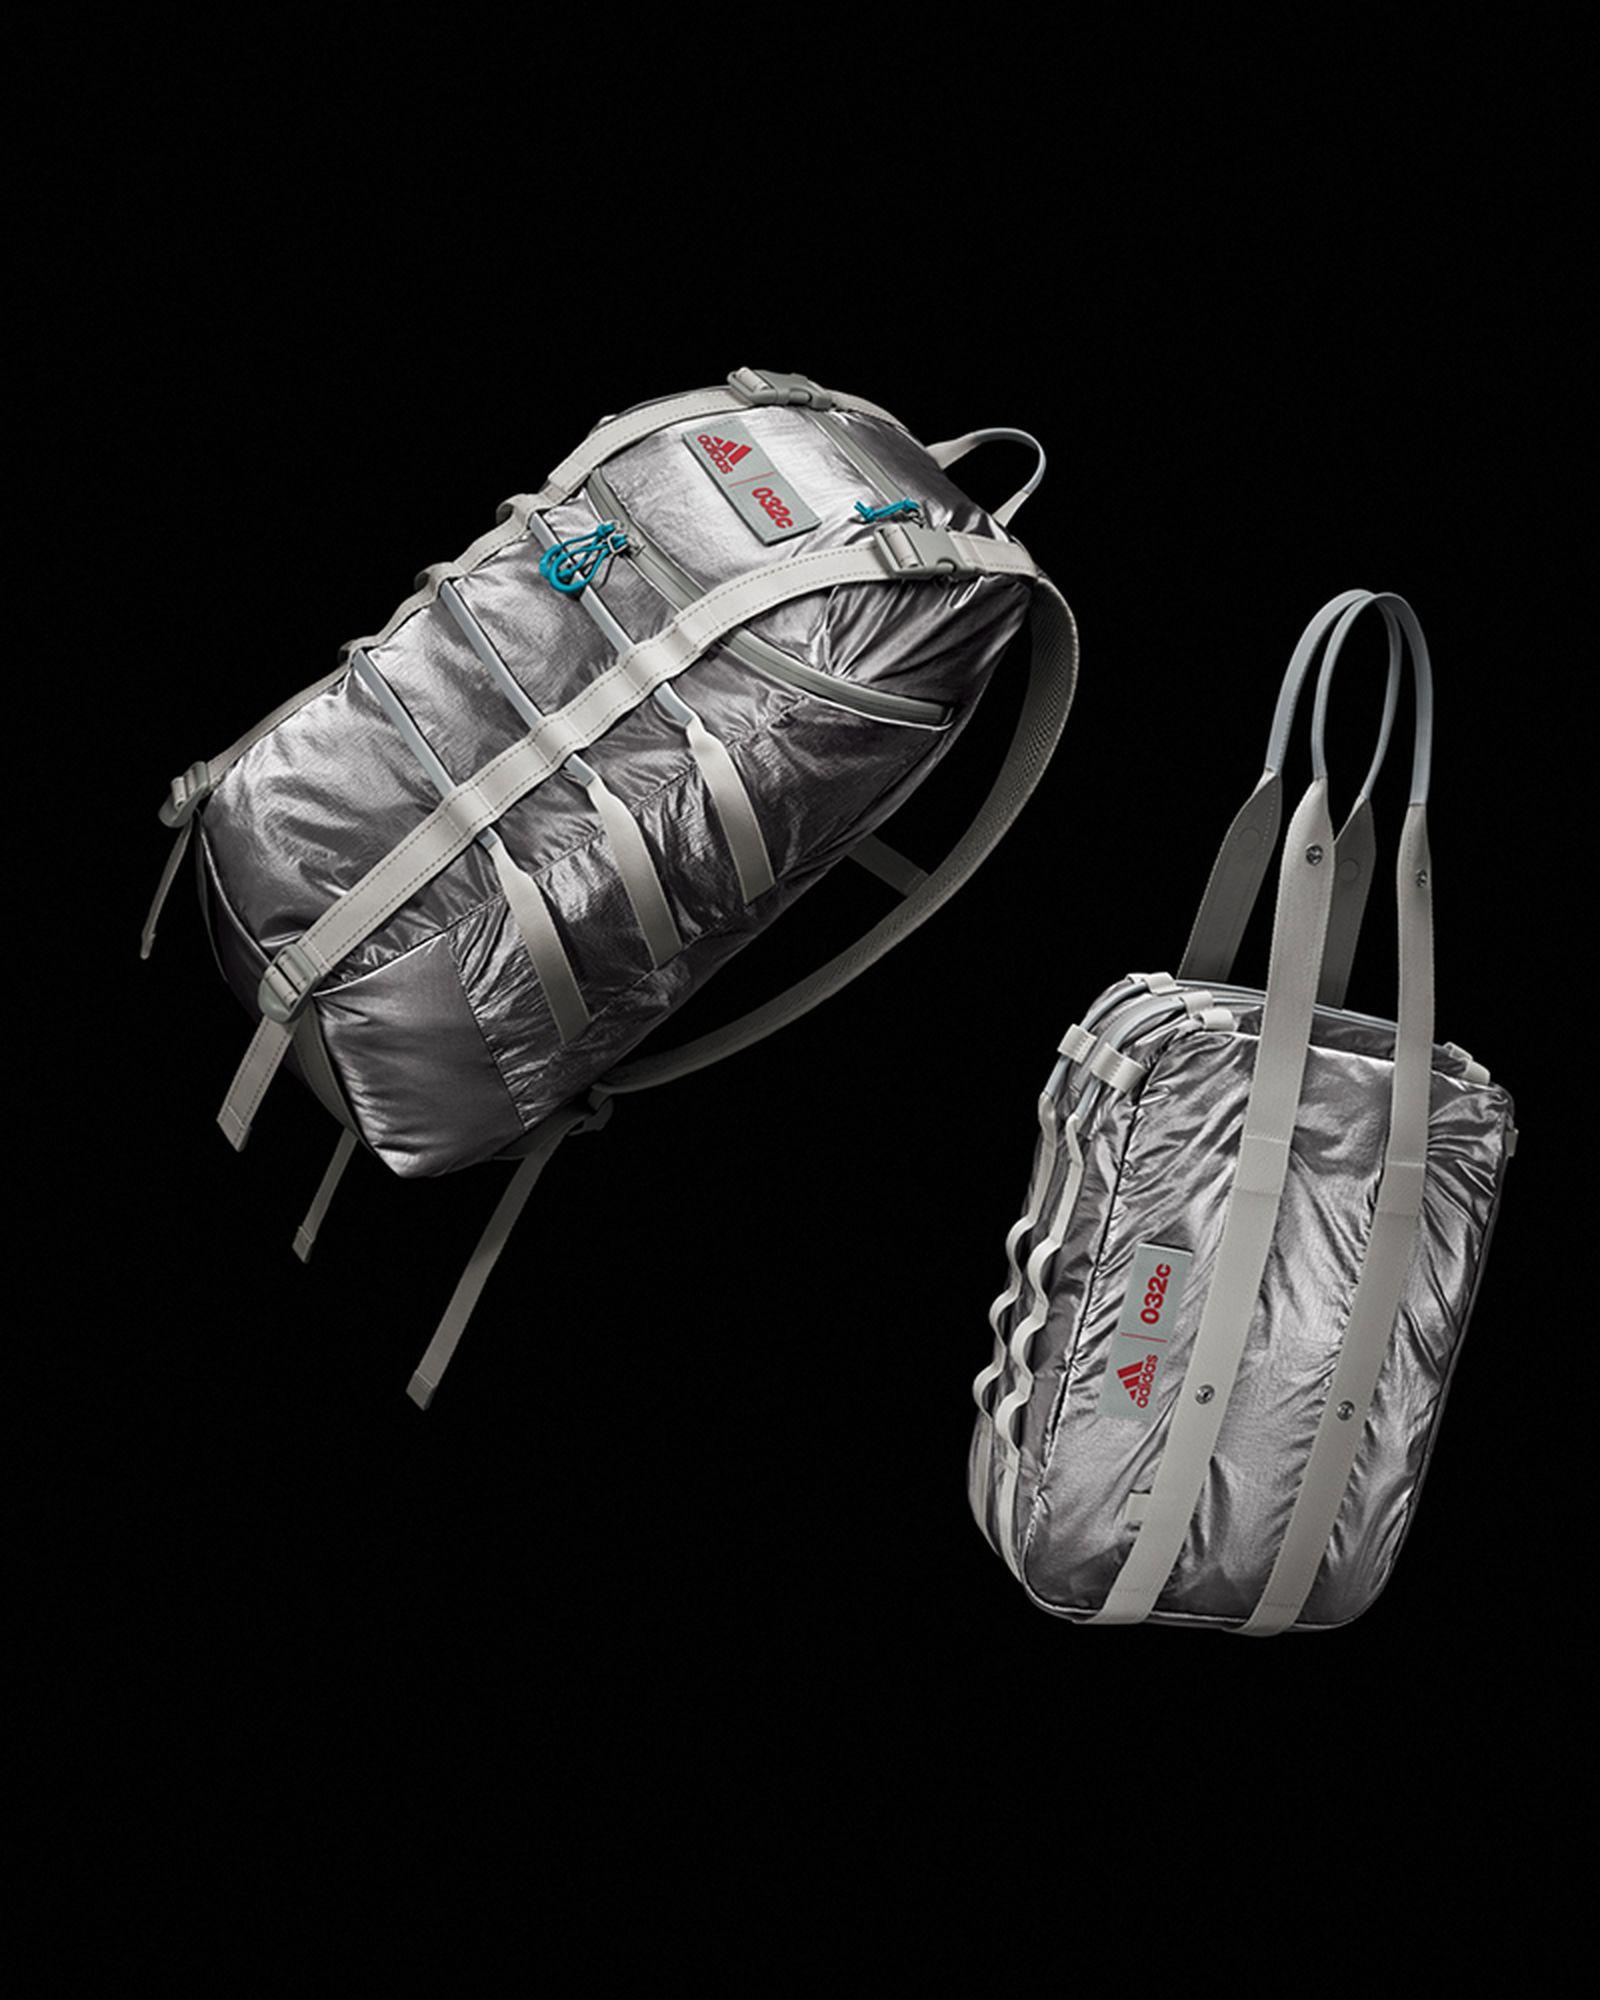 032c-adidas-06